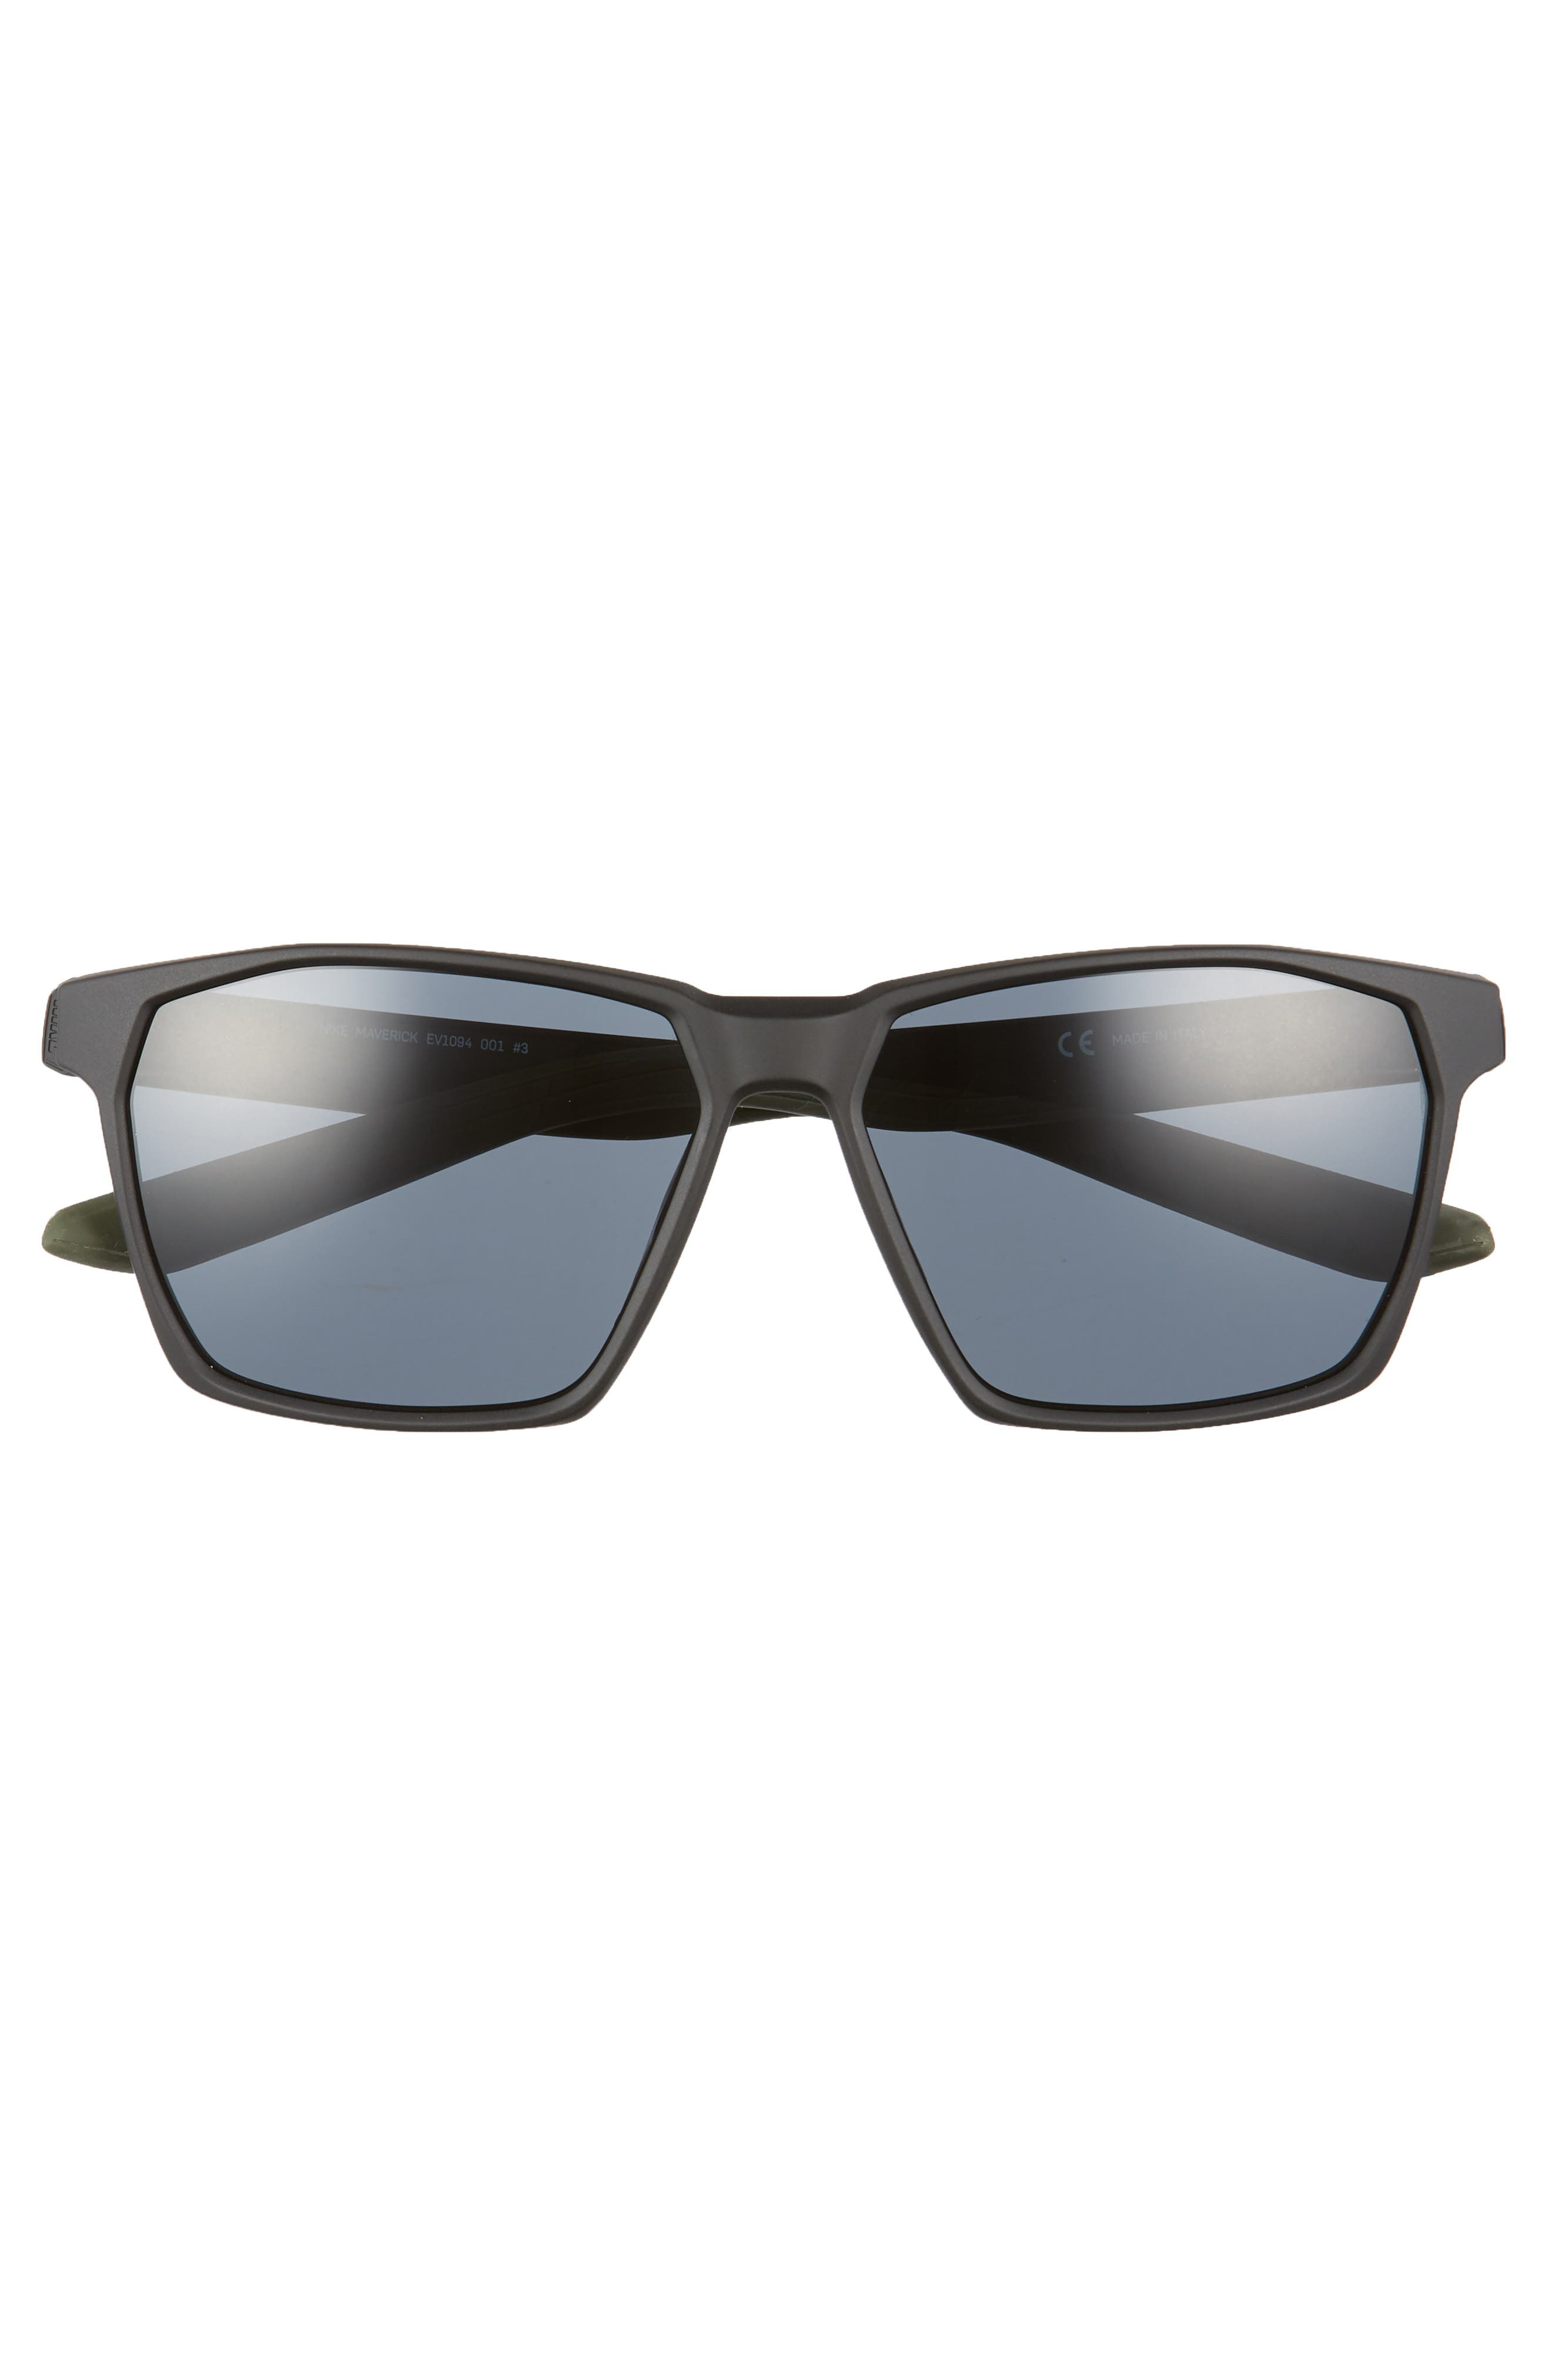 Maverick 59mm Sunglasses,                             Alternate thumbnail 2, color,                             MATTE BLACK/ GREY